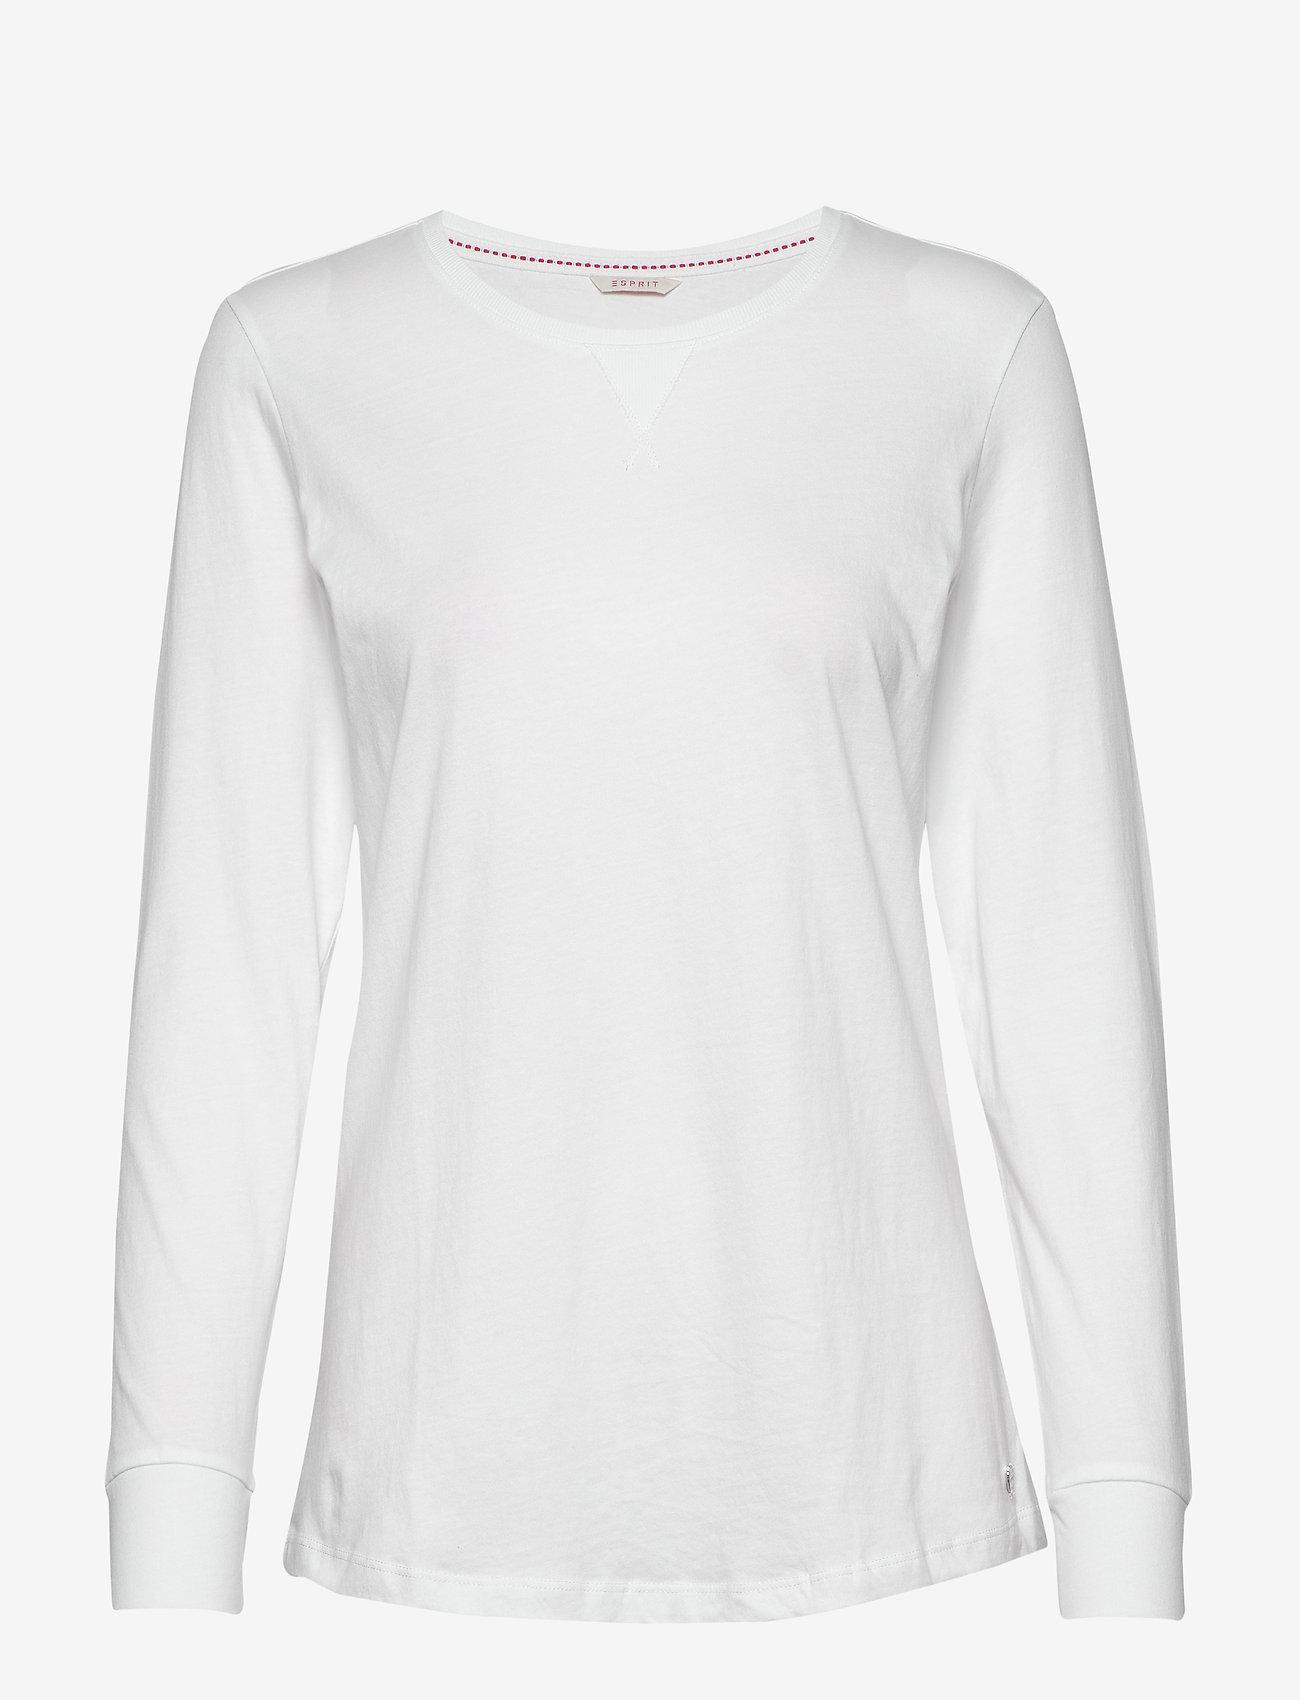 Esprit Bodywear Women - Night-T-Shirts - overdele - white - 0